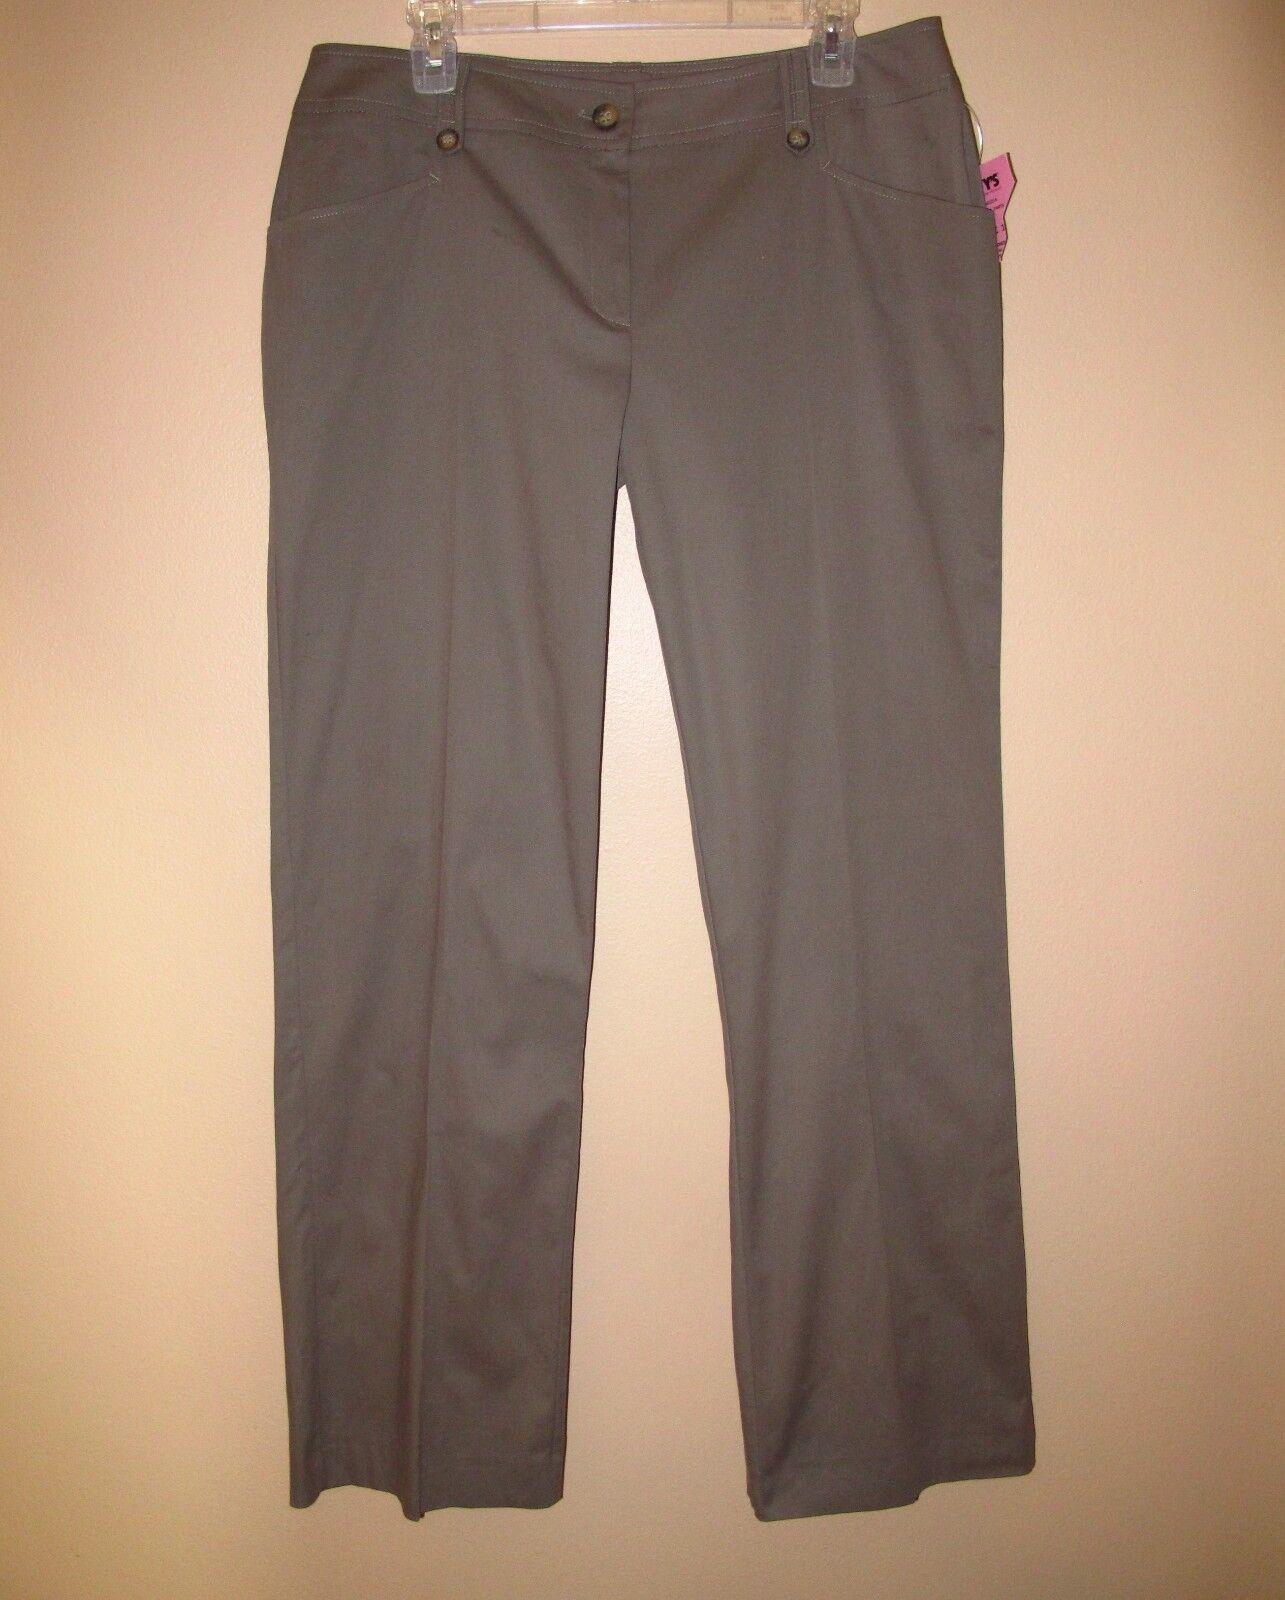 Marina Rinaldi Max Mara Bootcut Dark Taupe Grey Stretch Cotton Pants MR21 12-14W